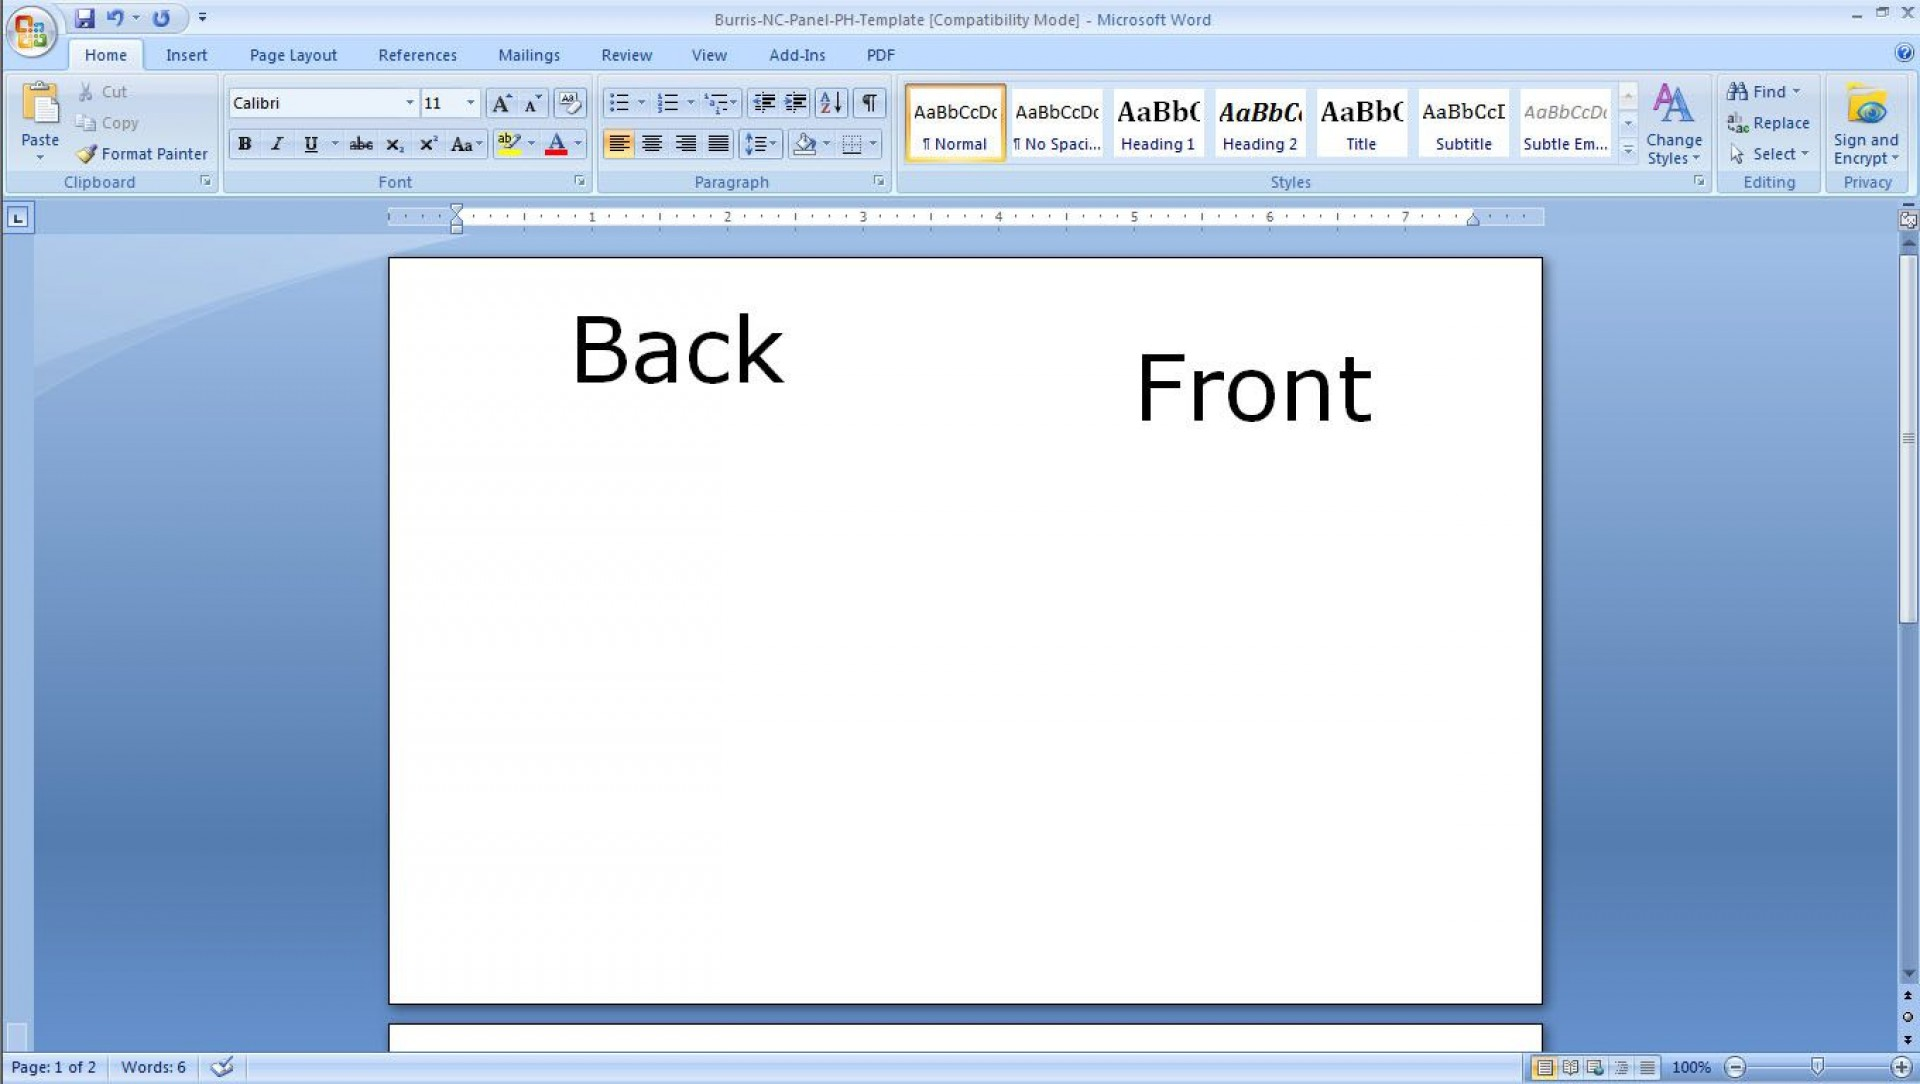 010 Sensational Microsoft Word Card Template High Resolution  Birthday Download Busines Free1920